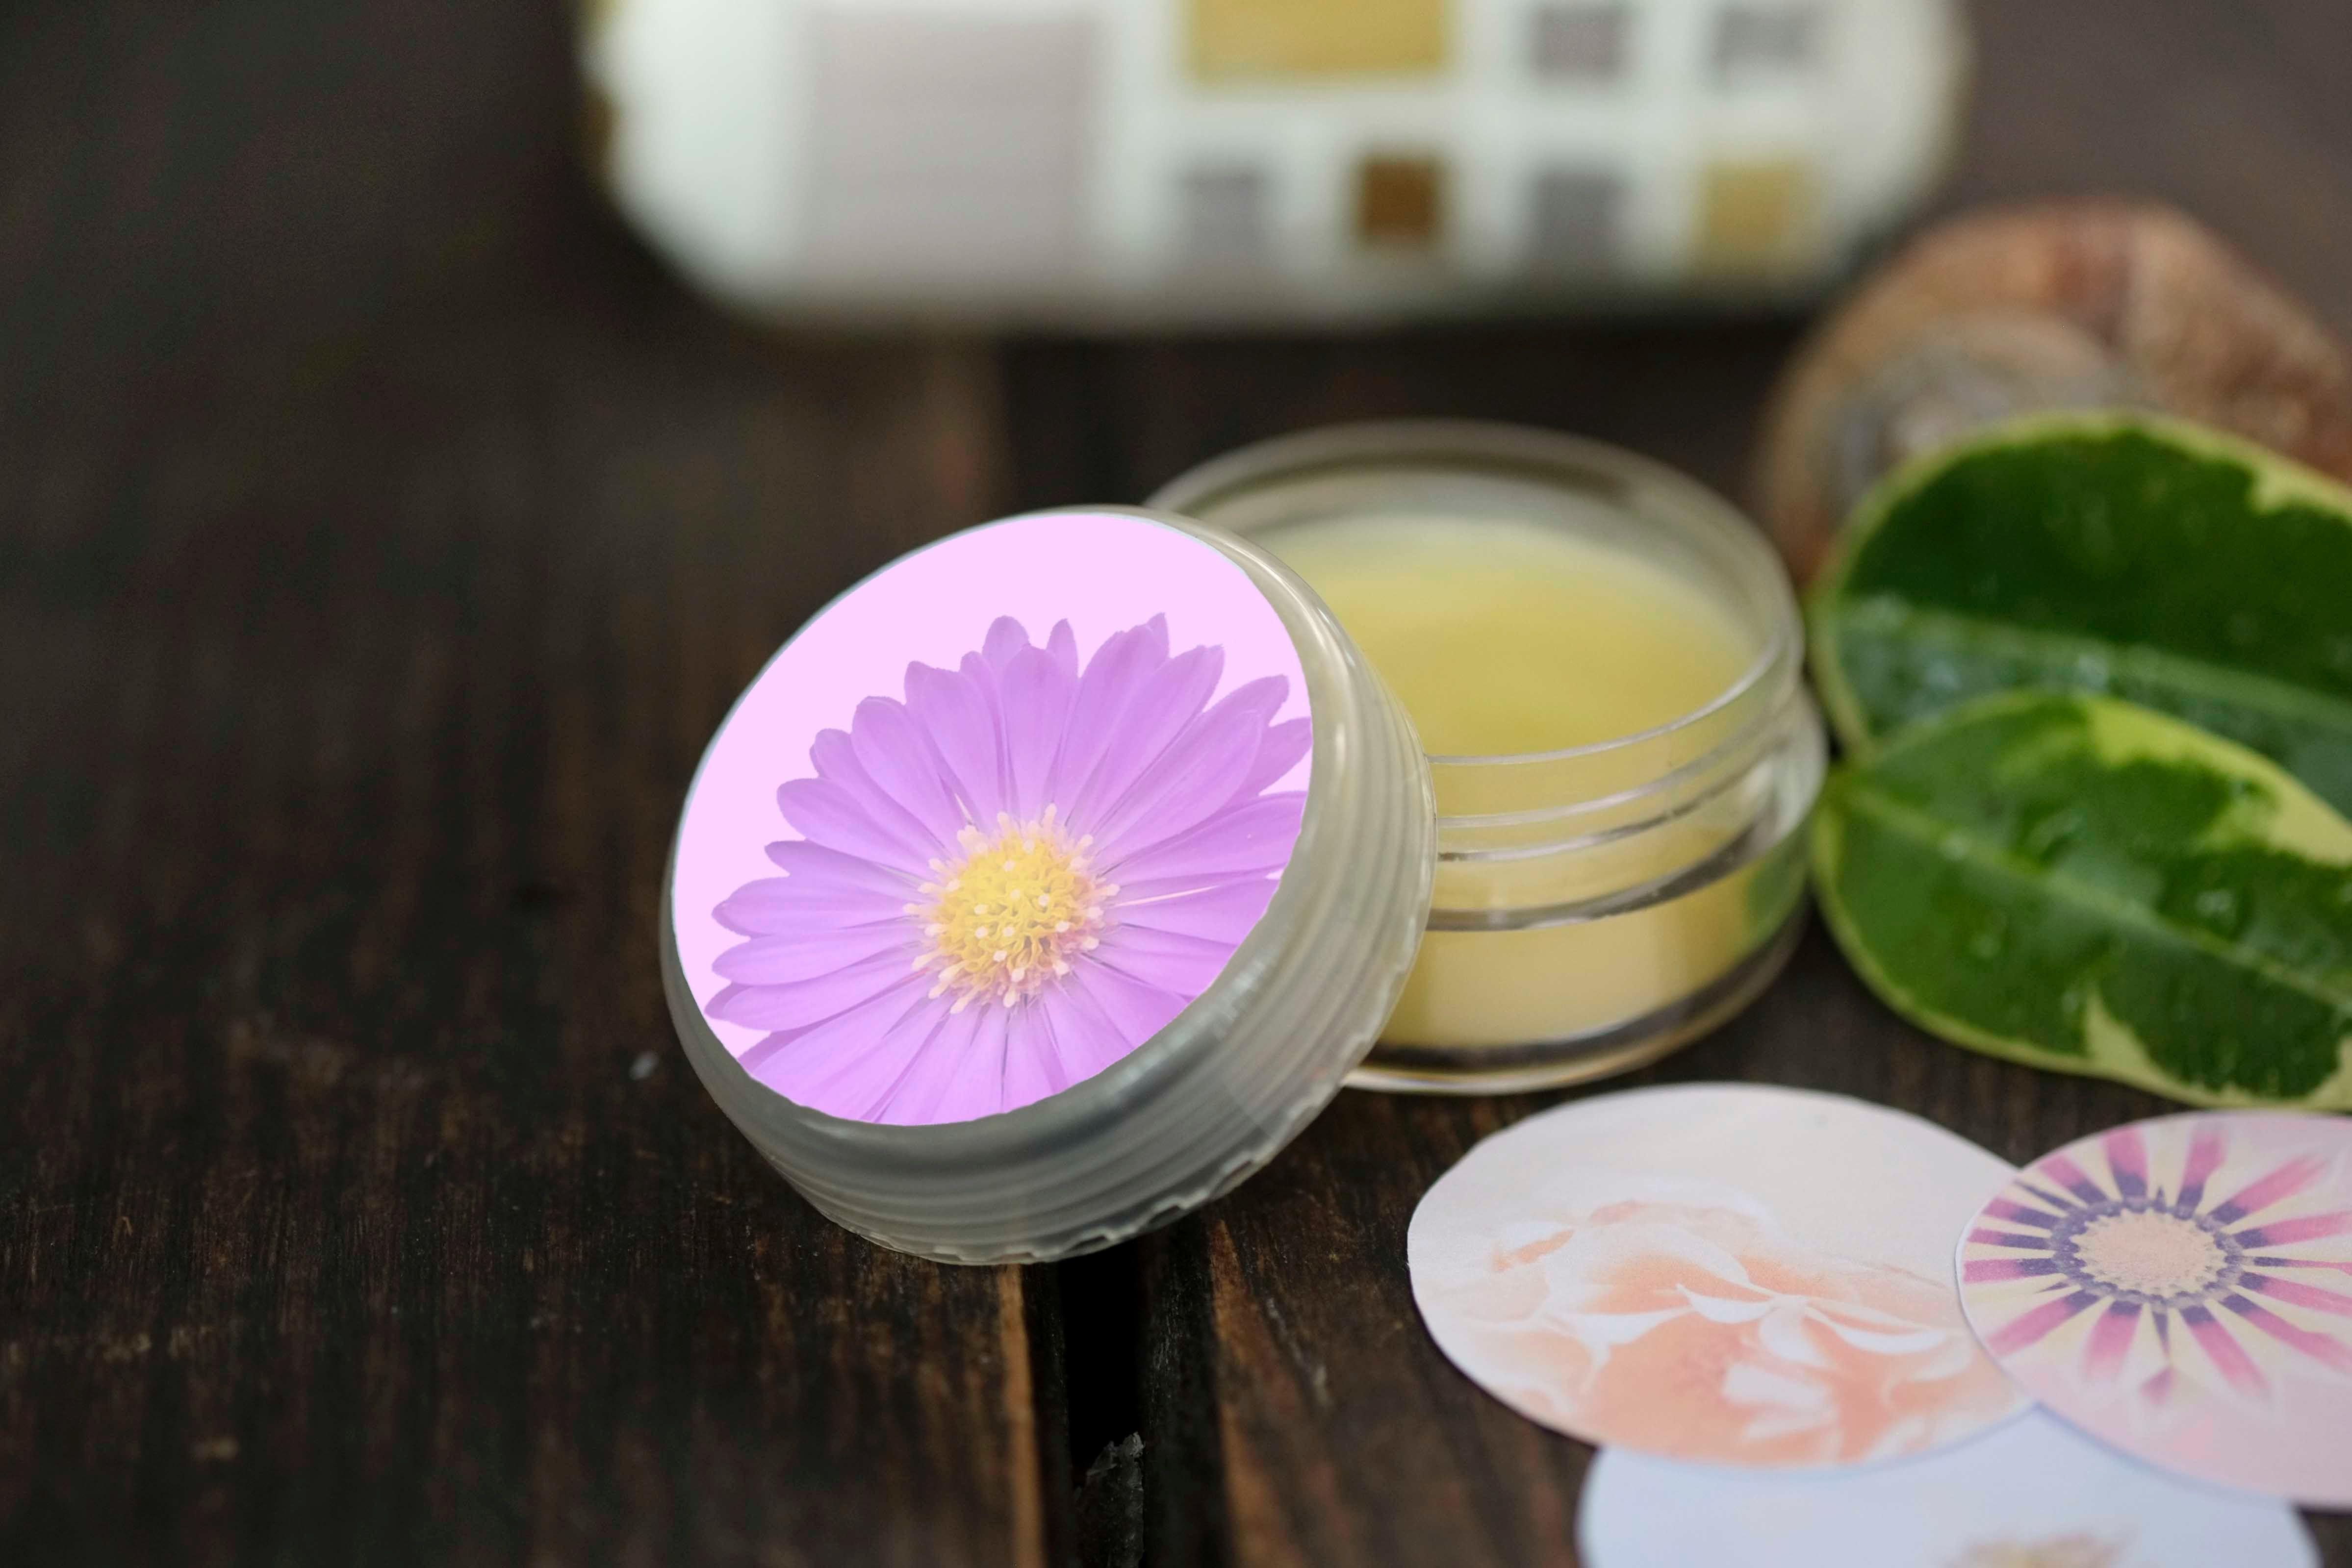 diy parfum balsam duftender parfumbalsam selbst gemacht naturseife und kosmetik selber machen. Black Bedroom Furniture Sets. Home Design Ideas